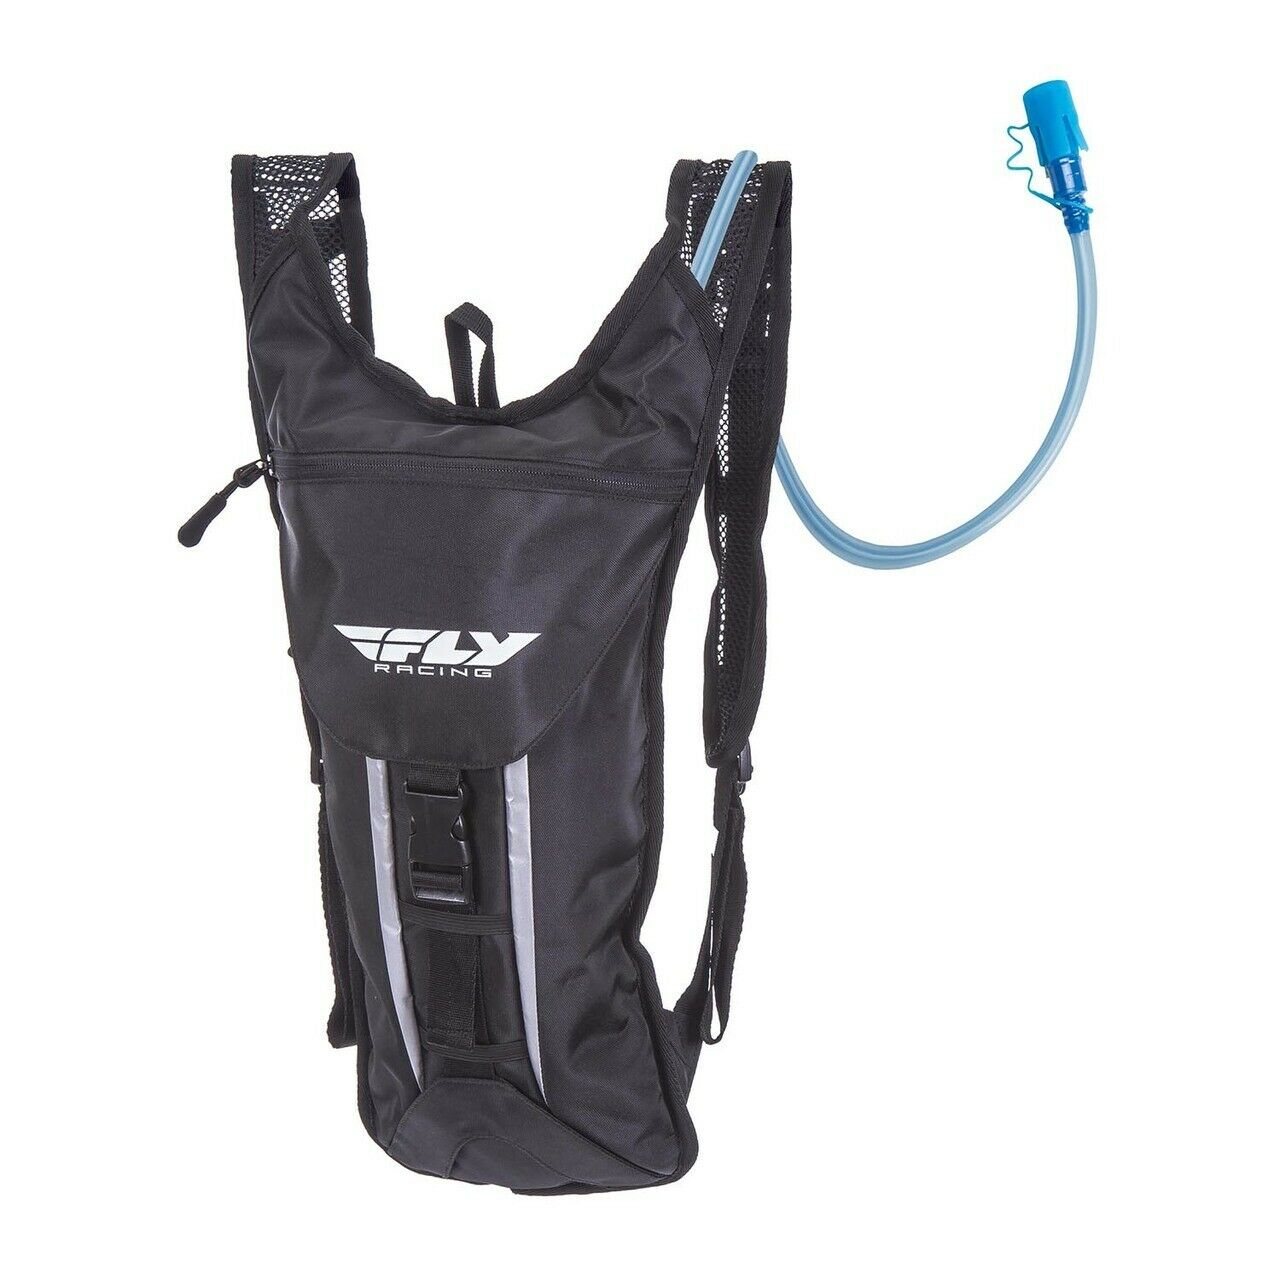 Fly Racing 2019 Hydration Pack Hydro Bag Black 70oz MX ENDURO